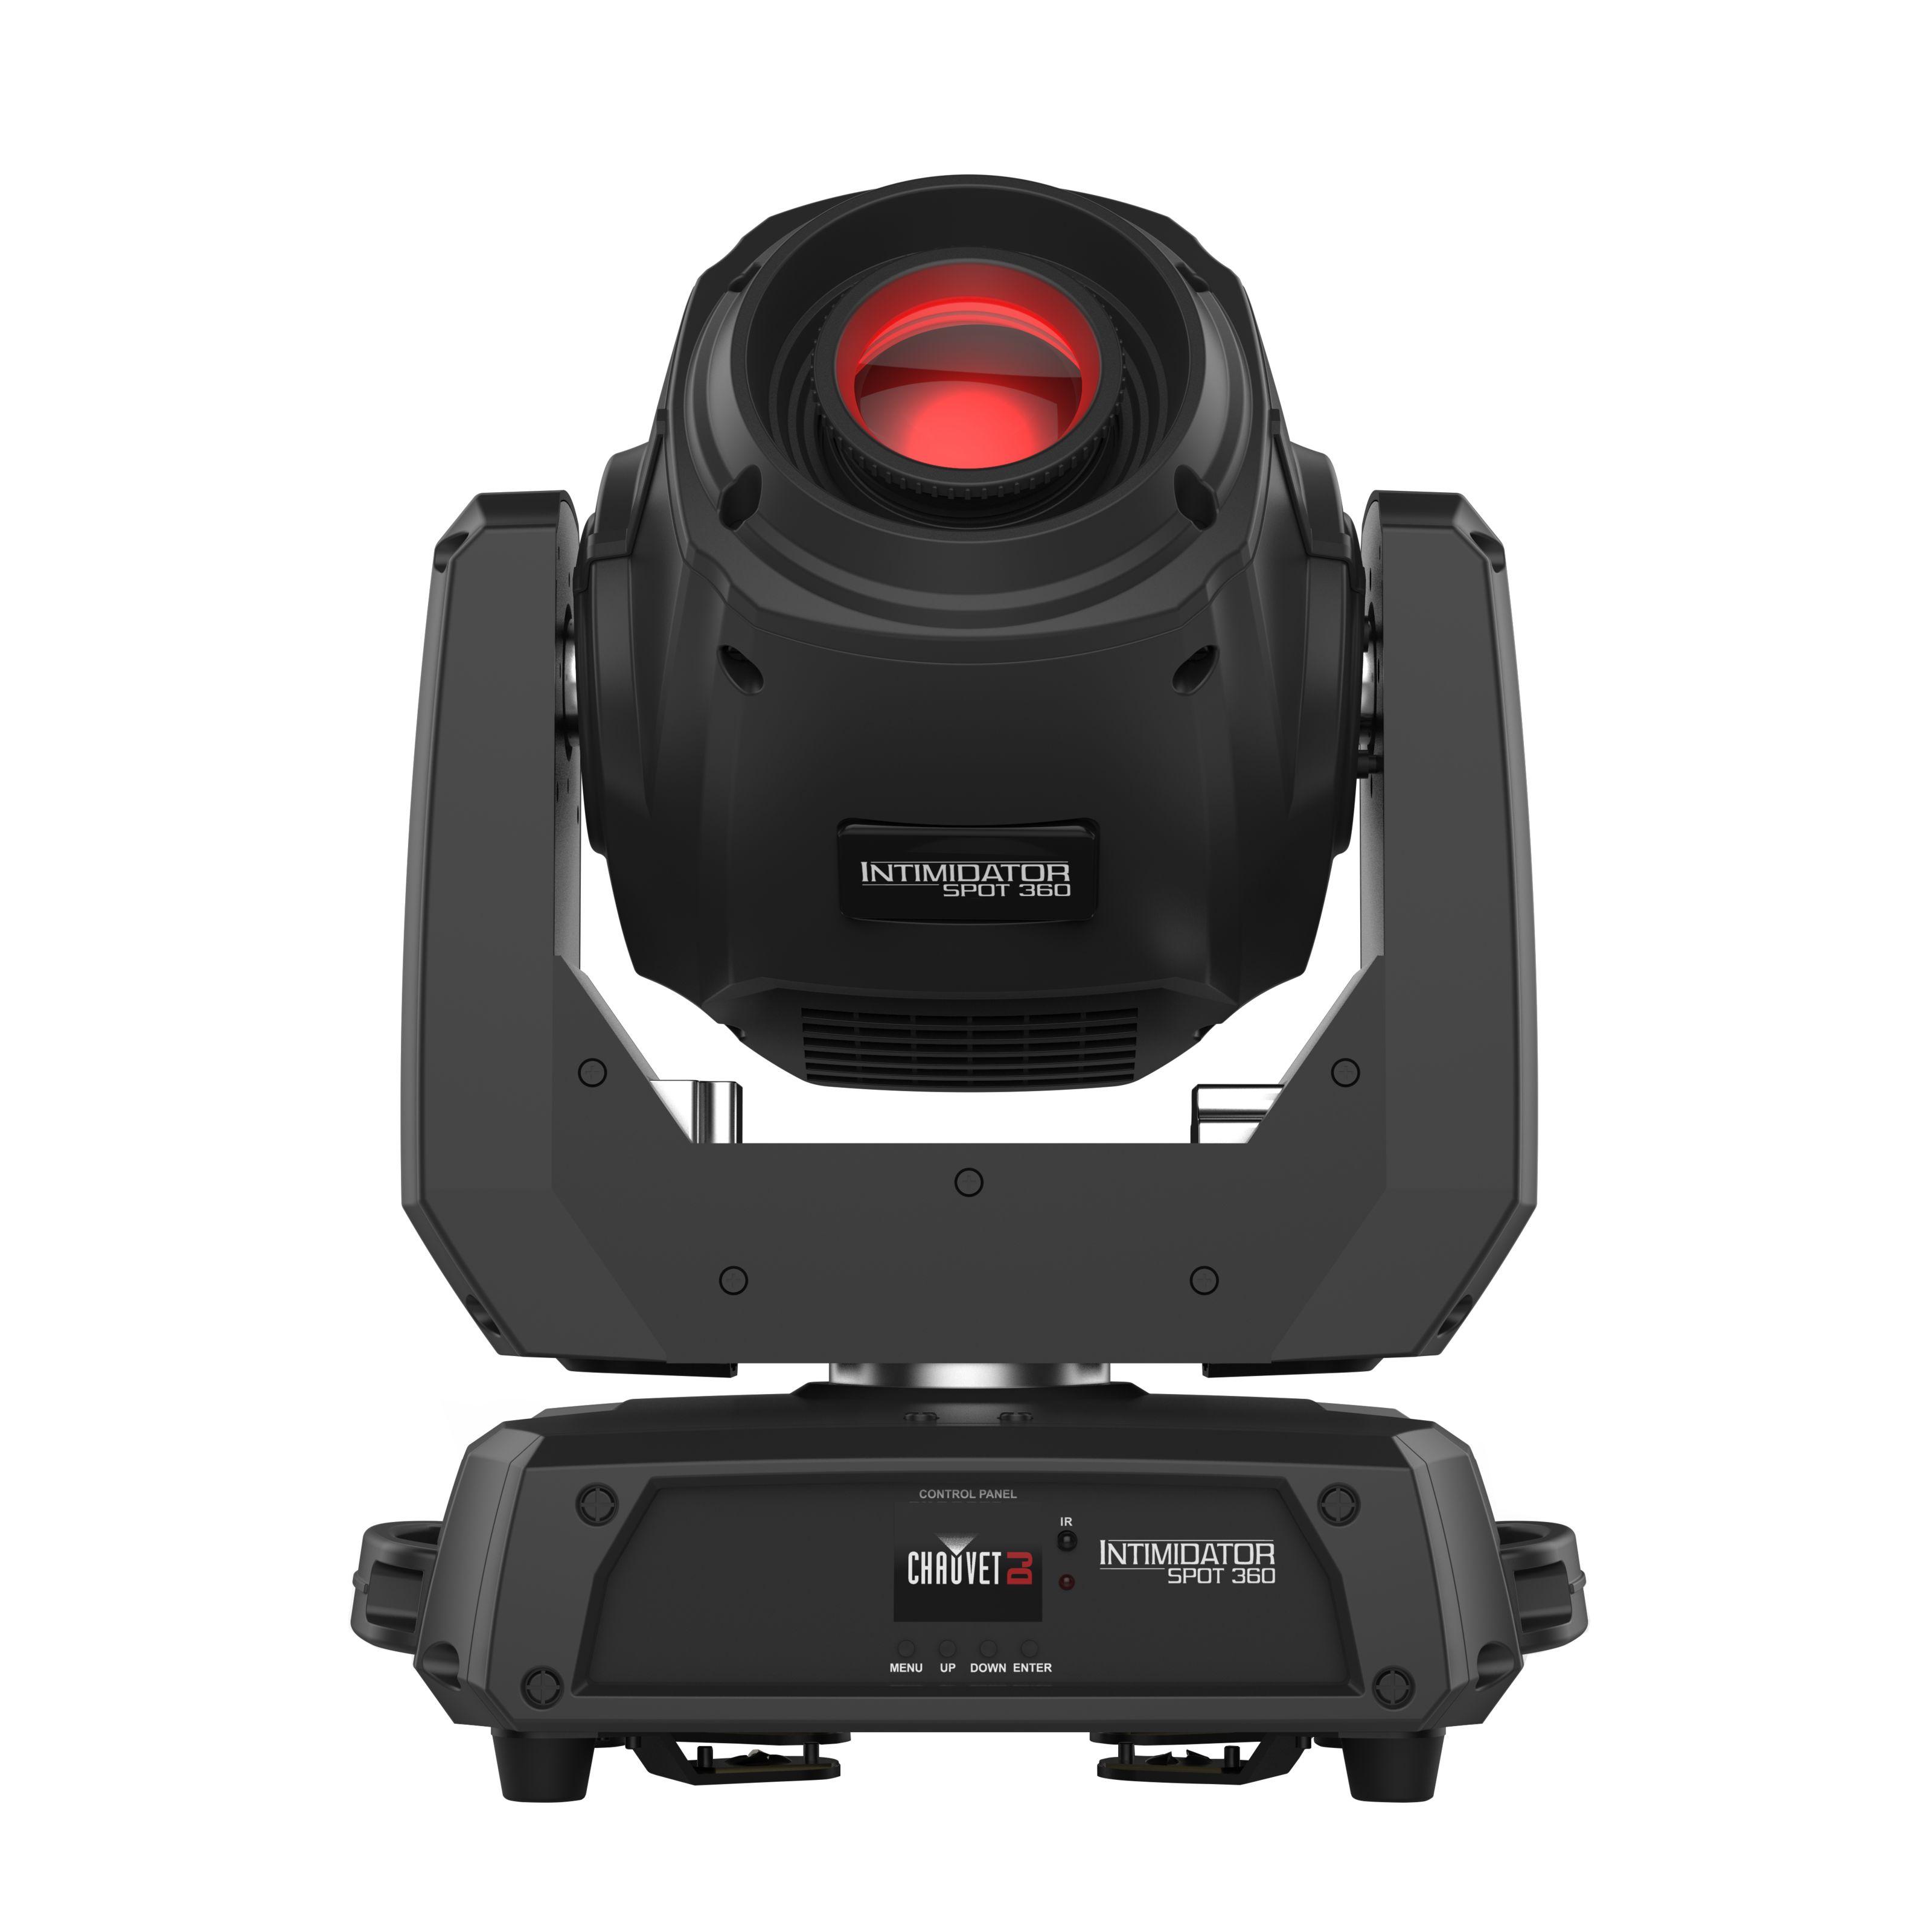 Chauvet DJ - Intimidator Spot 360 INTIMSPOT360